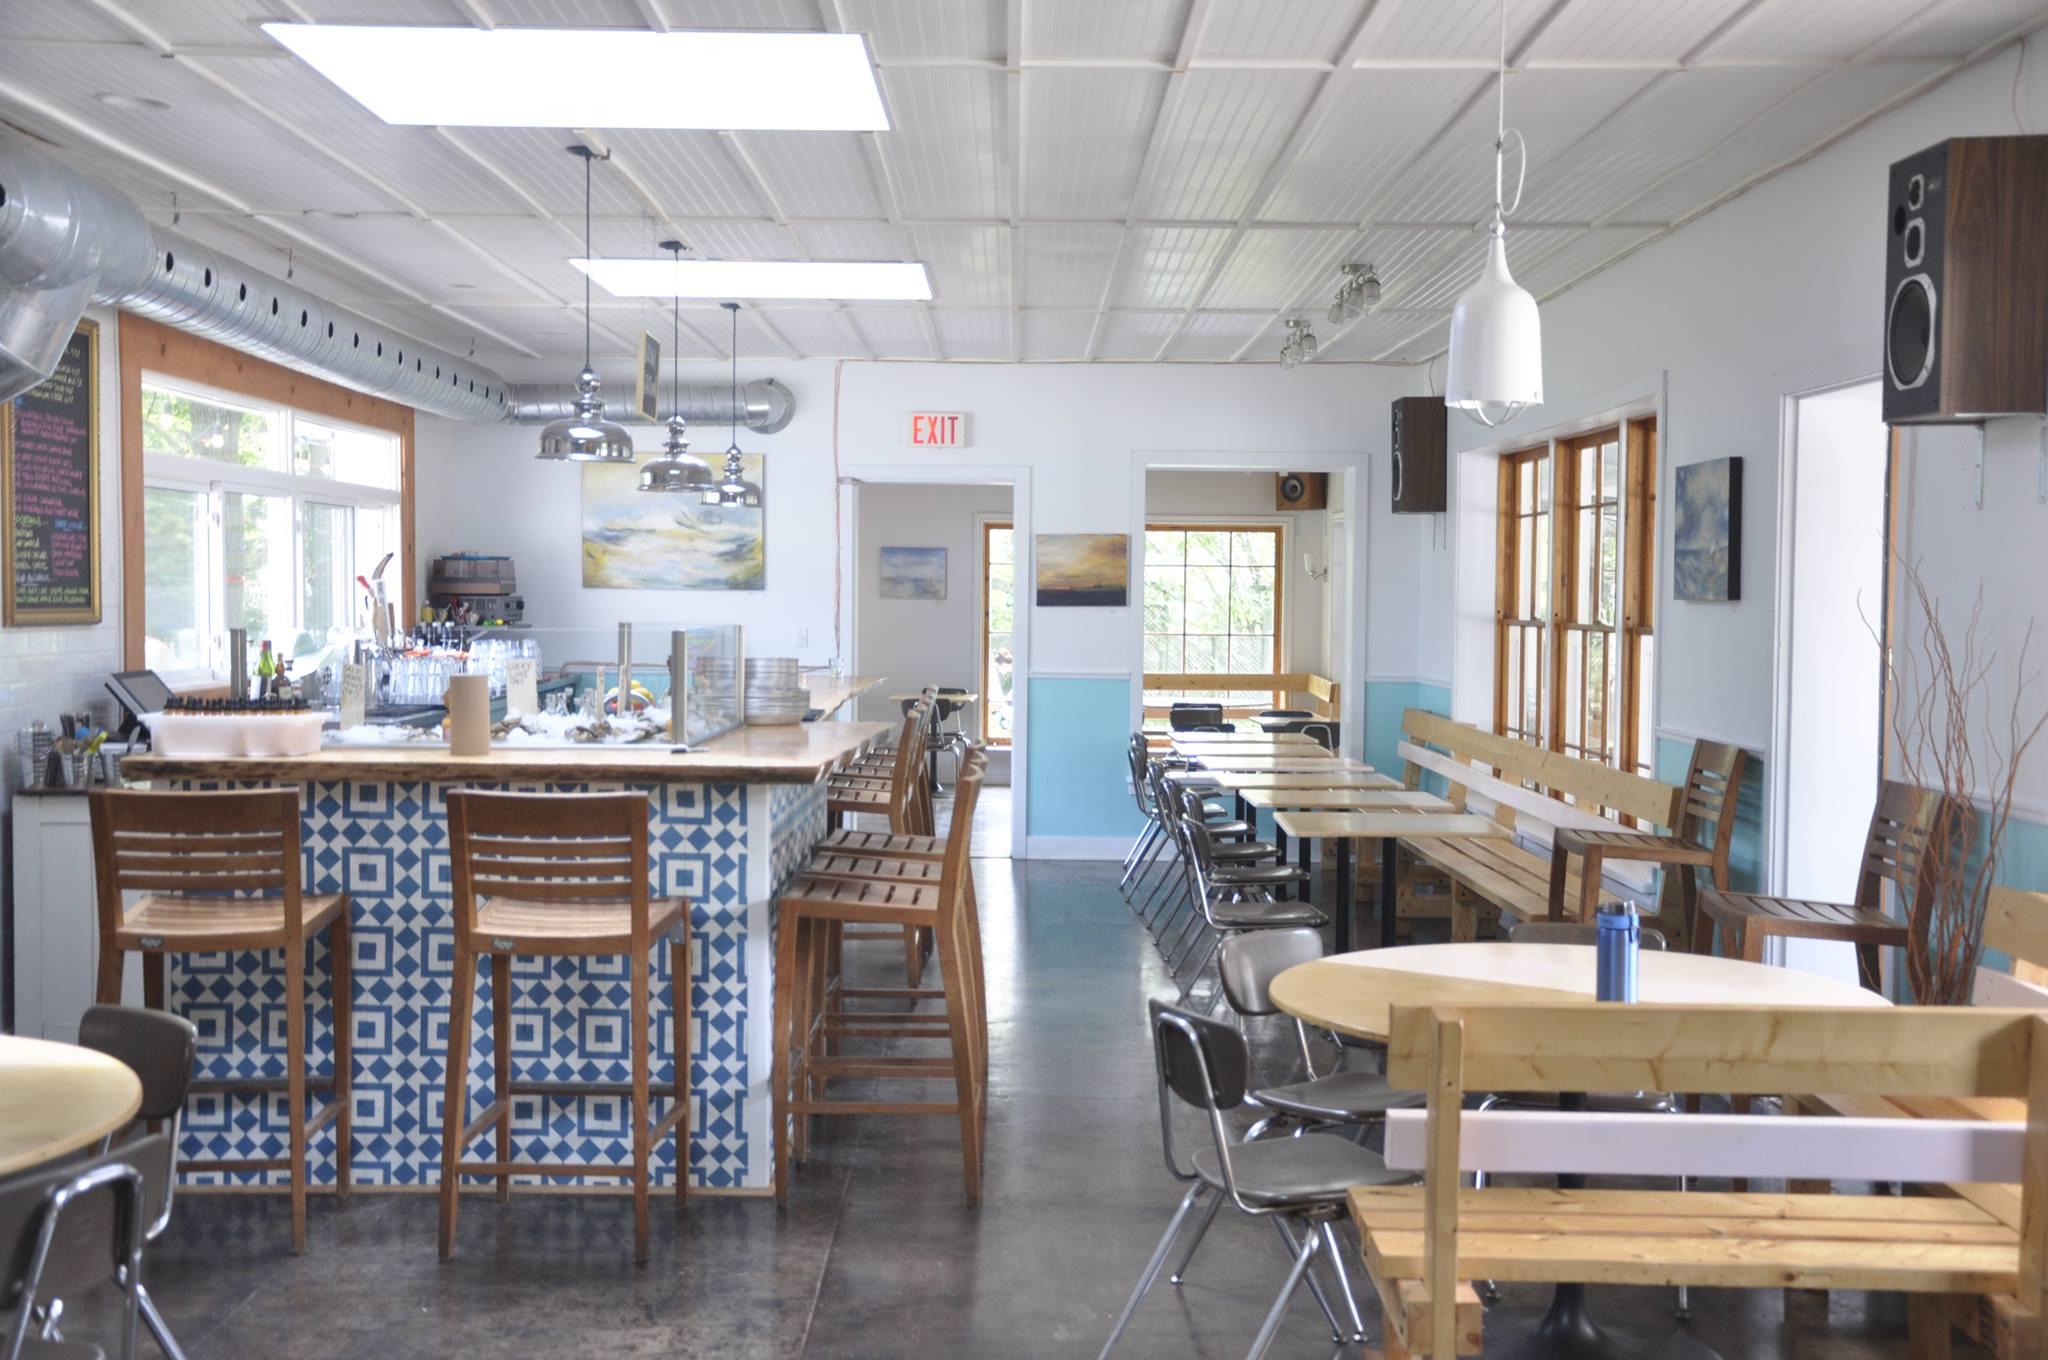 County restaurant in national spotlight